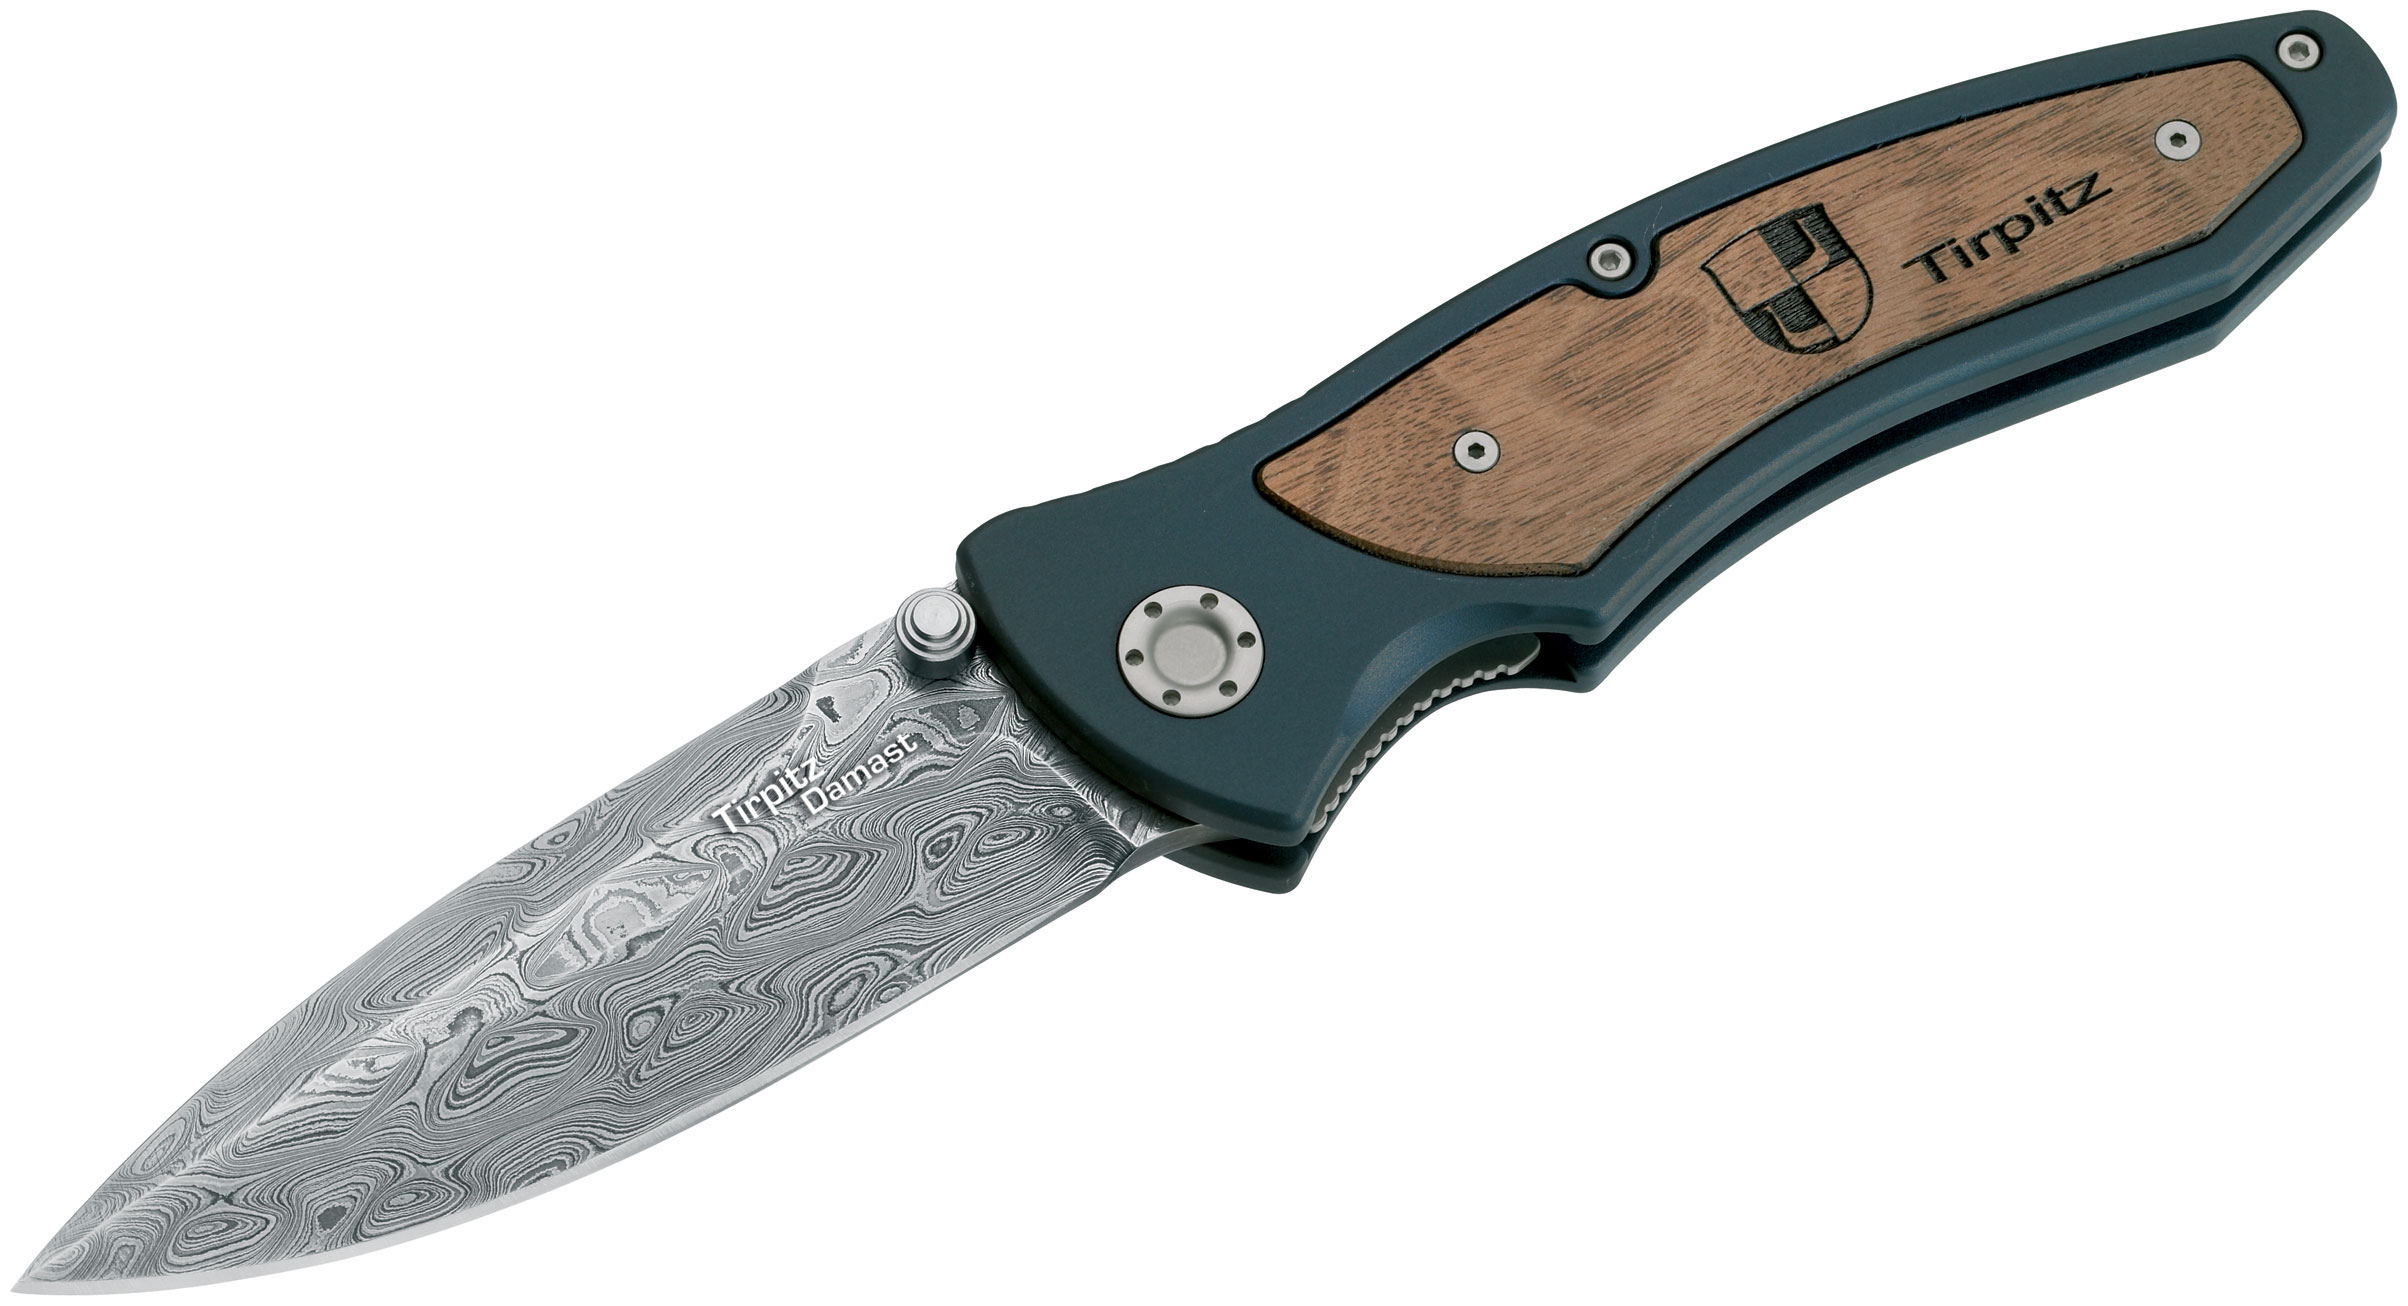 Boker Tirpitz Folding Knife 3-7/8 inch Damascus Blade, Aluminum Handles with Walnut Inlay